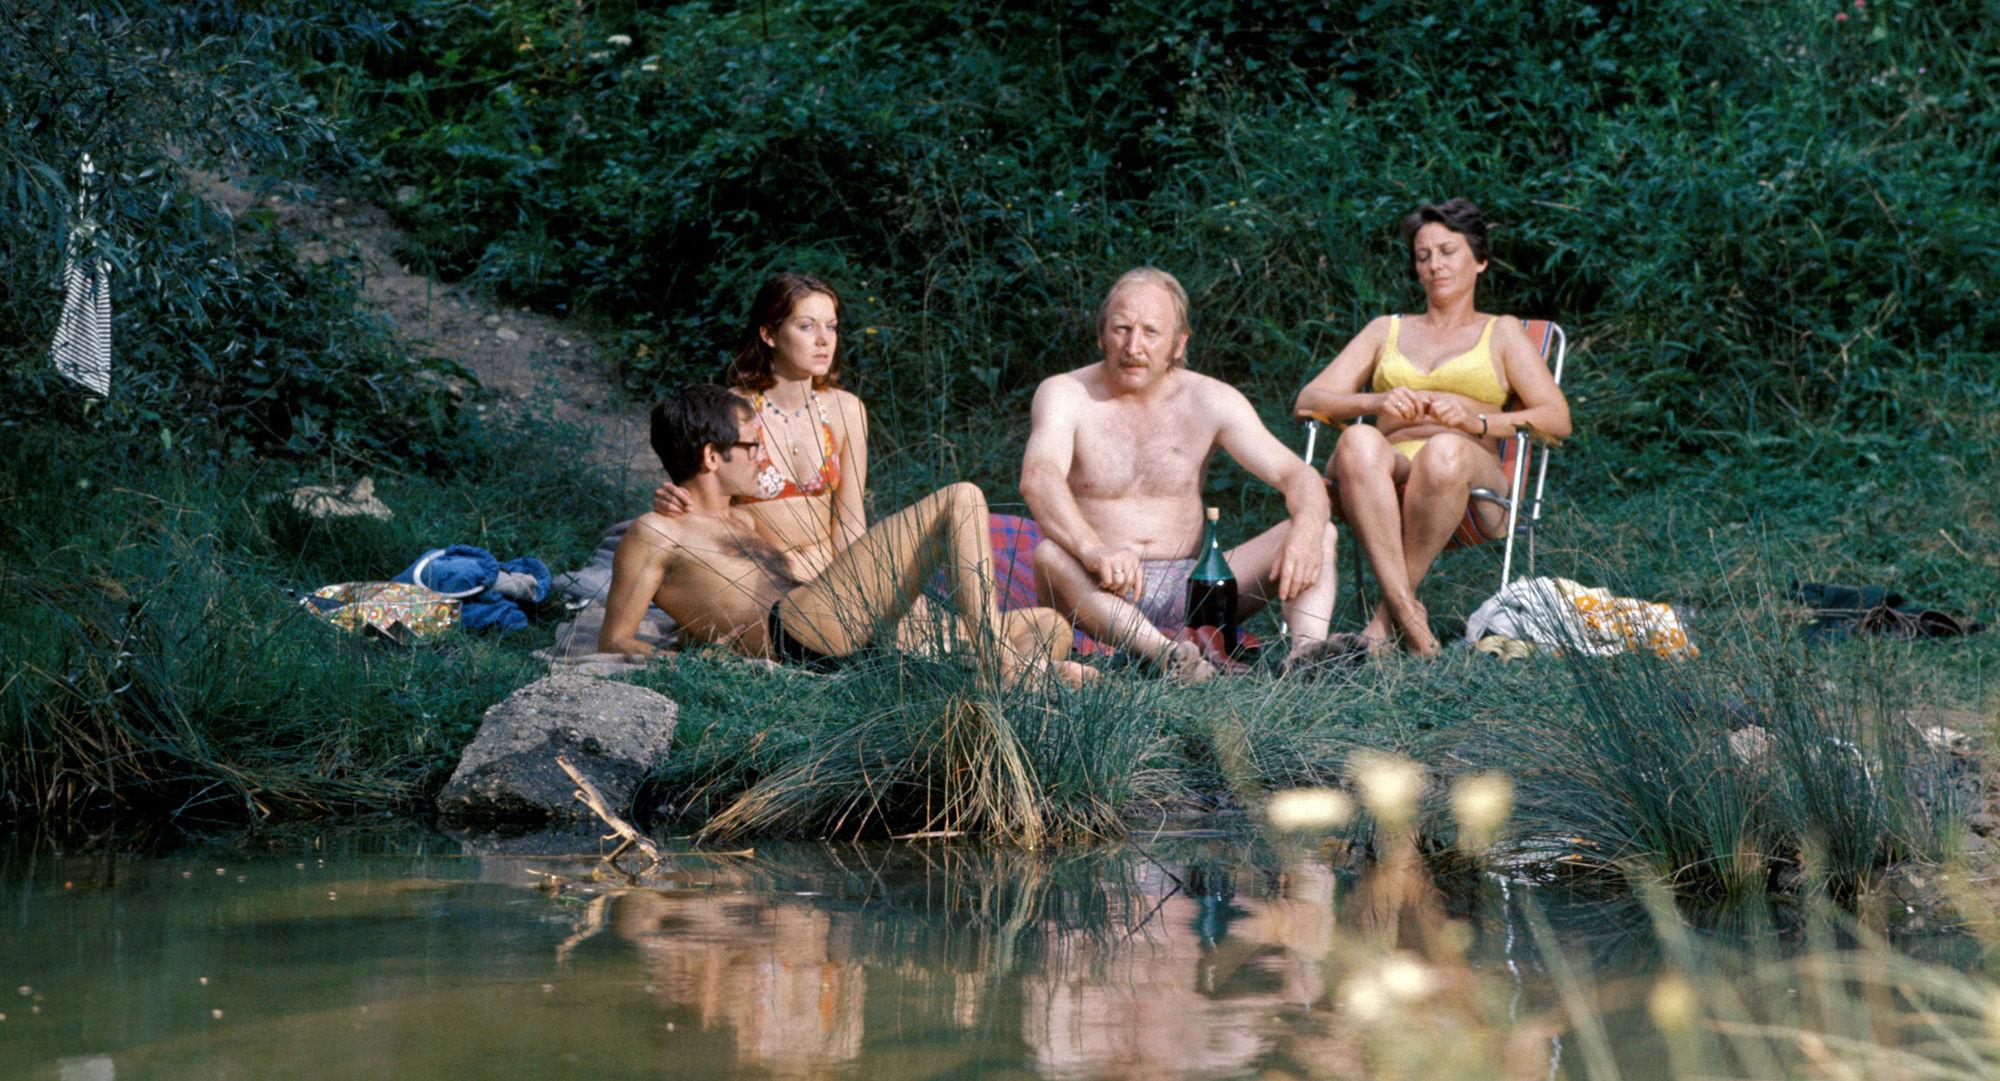 Franzi (Alexander Wächter), Hanni (Erika Deutinger), Mundl (Karl Merkatz), Toni (Ingrid Burkhard)